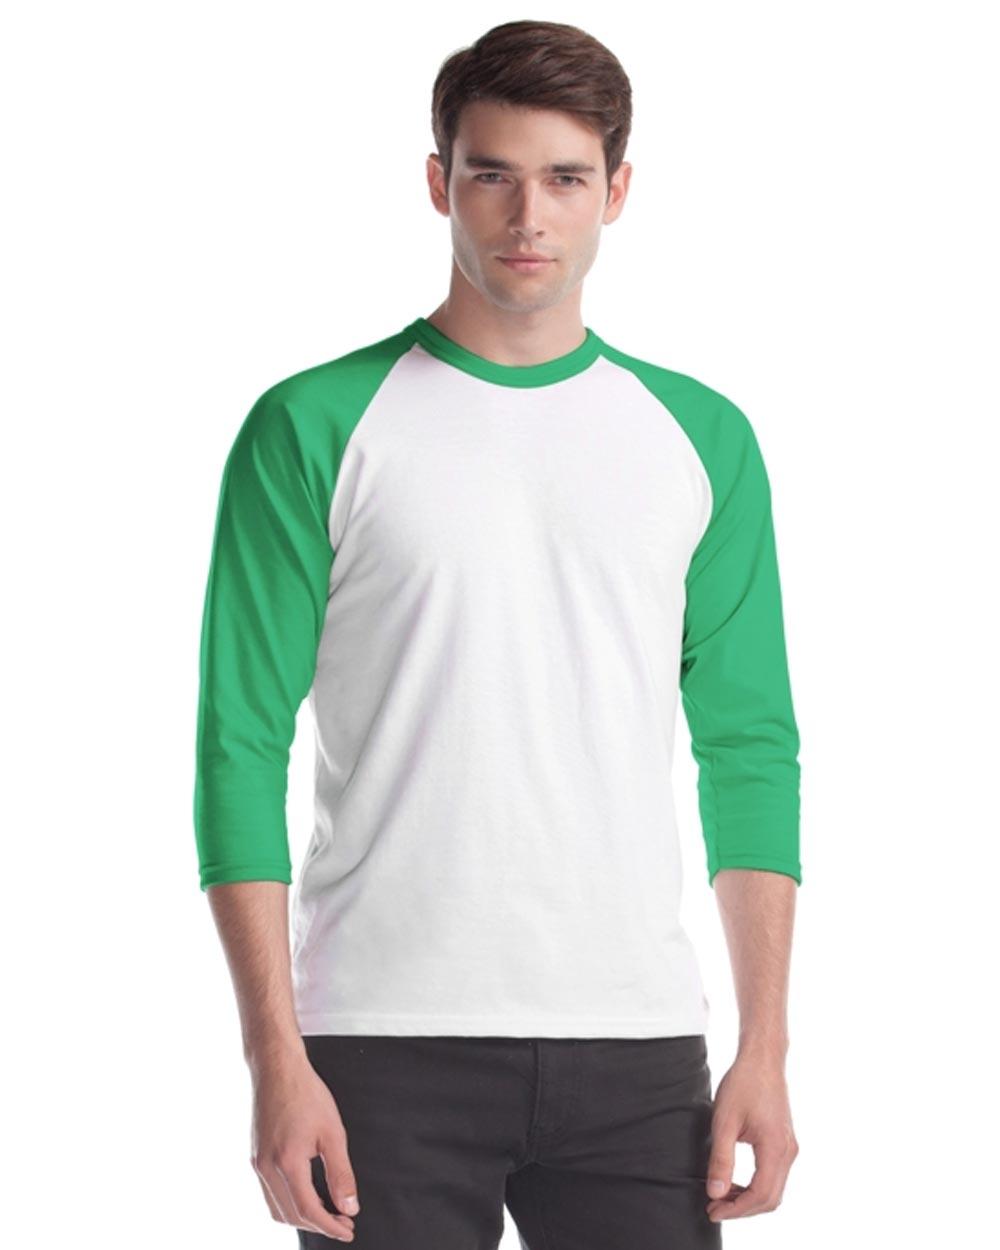 Jerico 3/4 Raglan Baseball T-Shirt